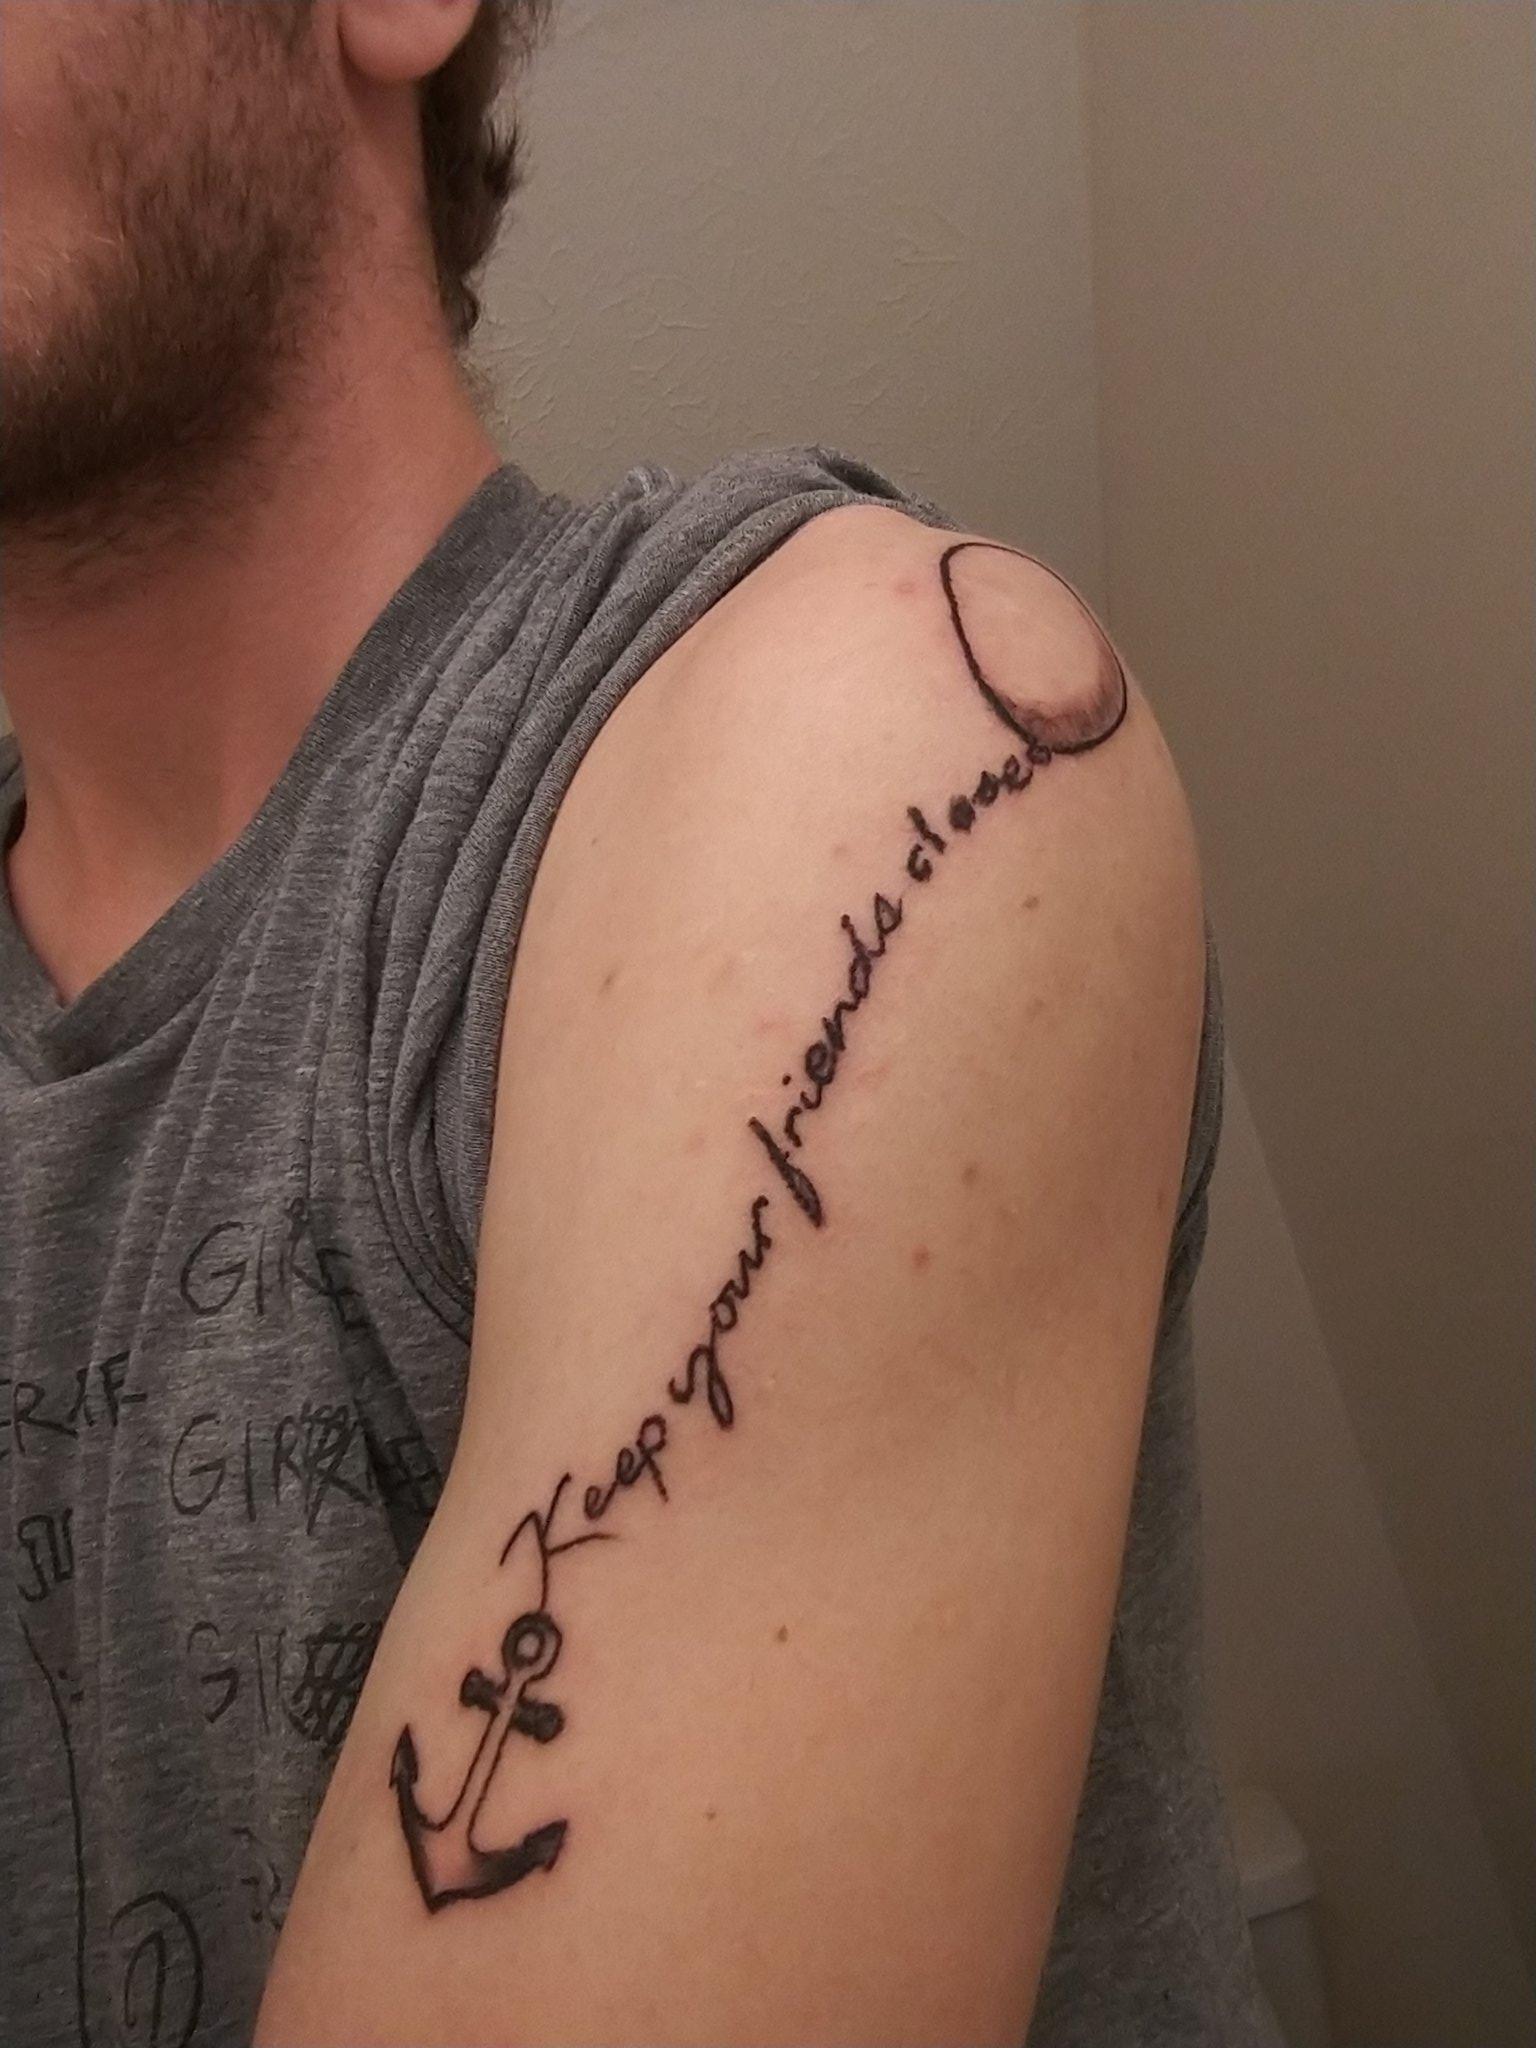 Keep Your Friends Close  on Noah Fischer's arm.